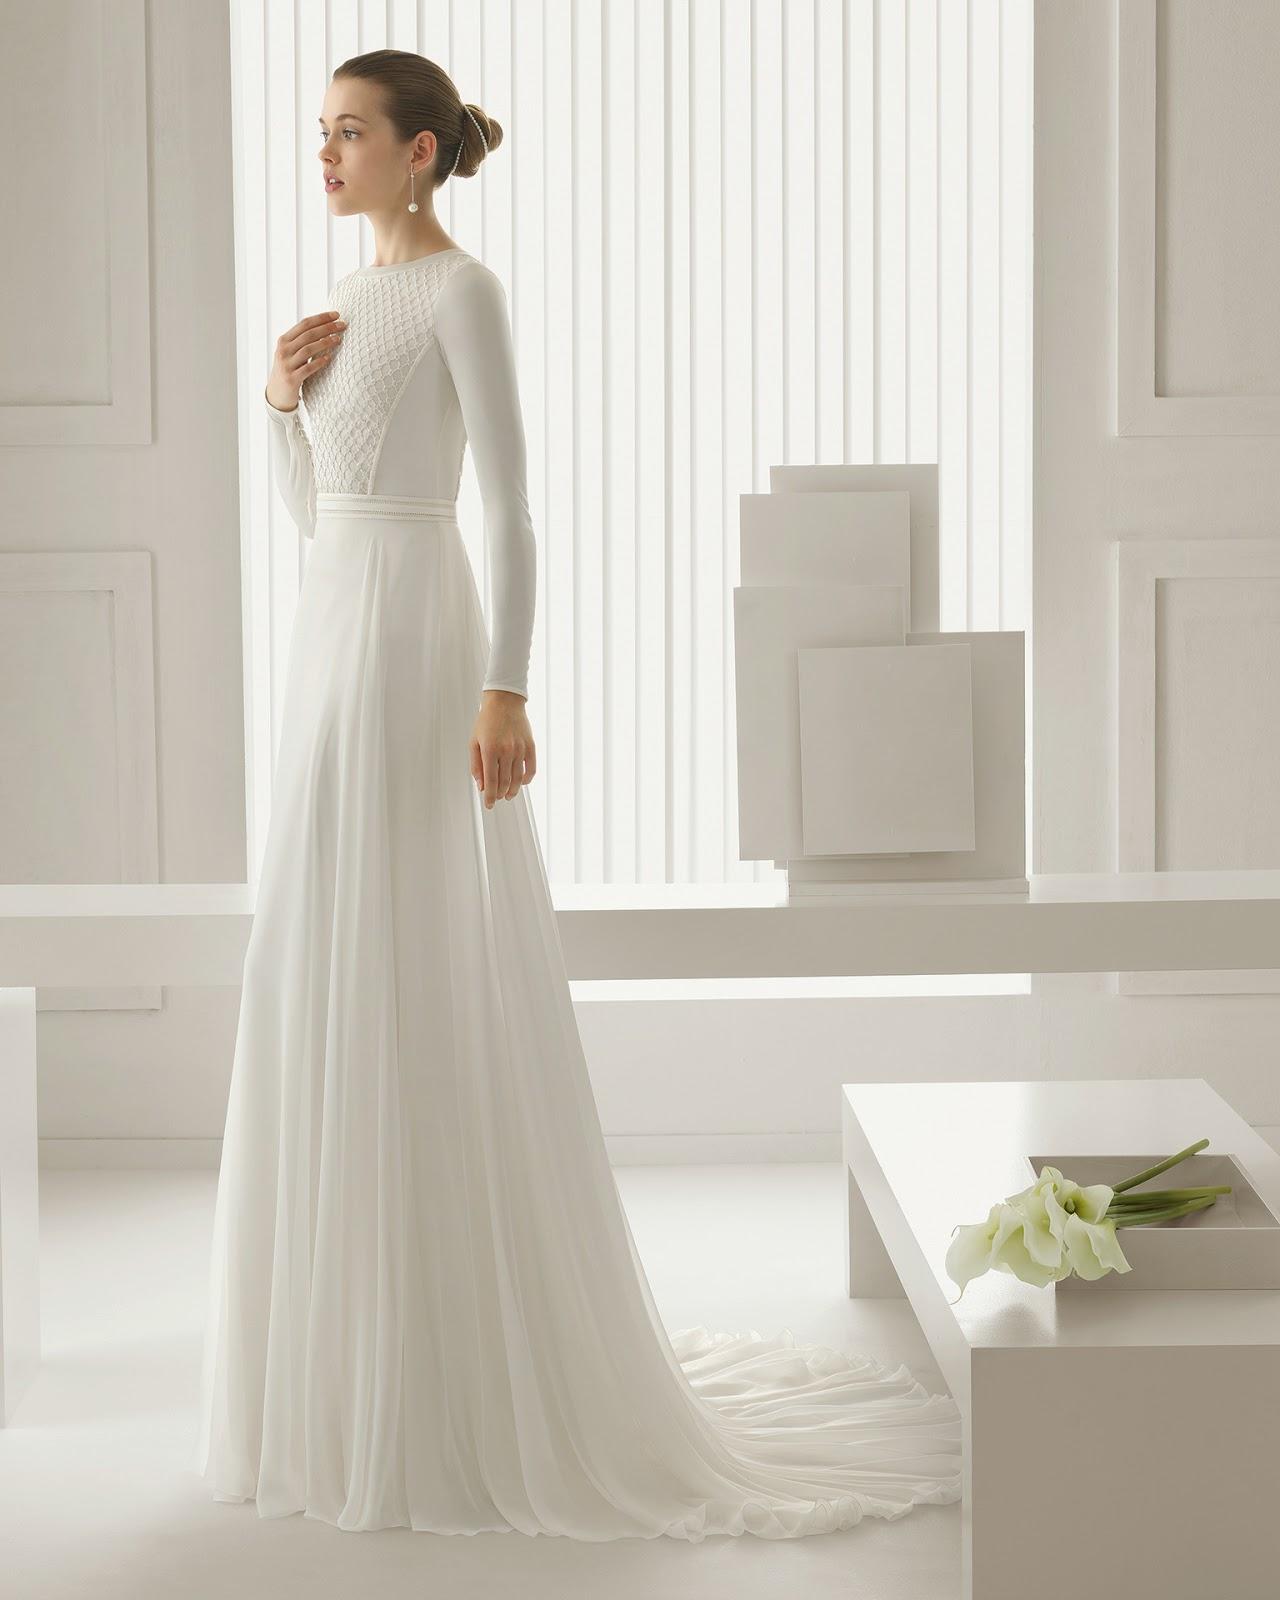 041bf2d02d83 Tendenze abiti da sposa 2015 - Moda nozze - Forum Matrimonio.com